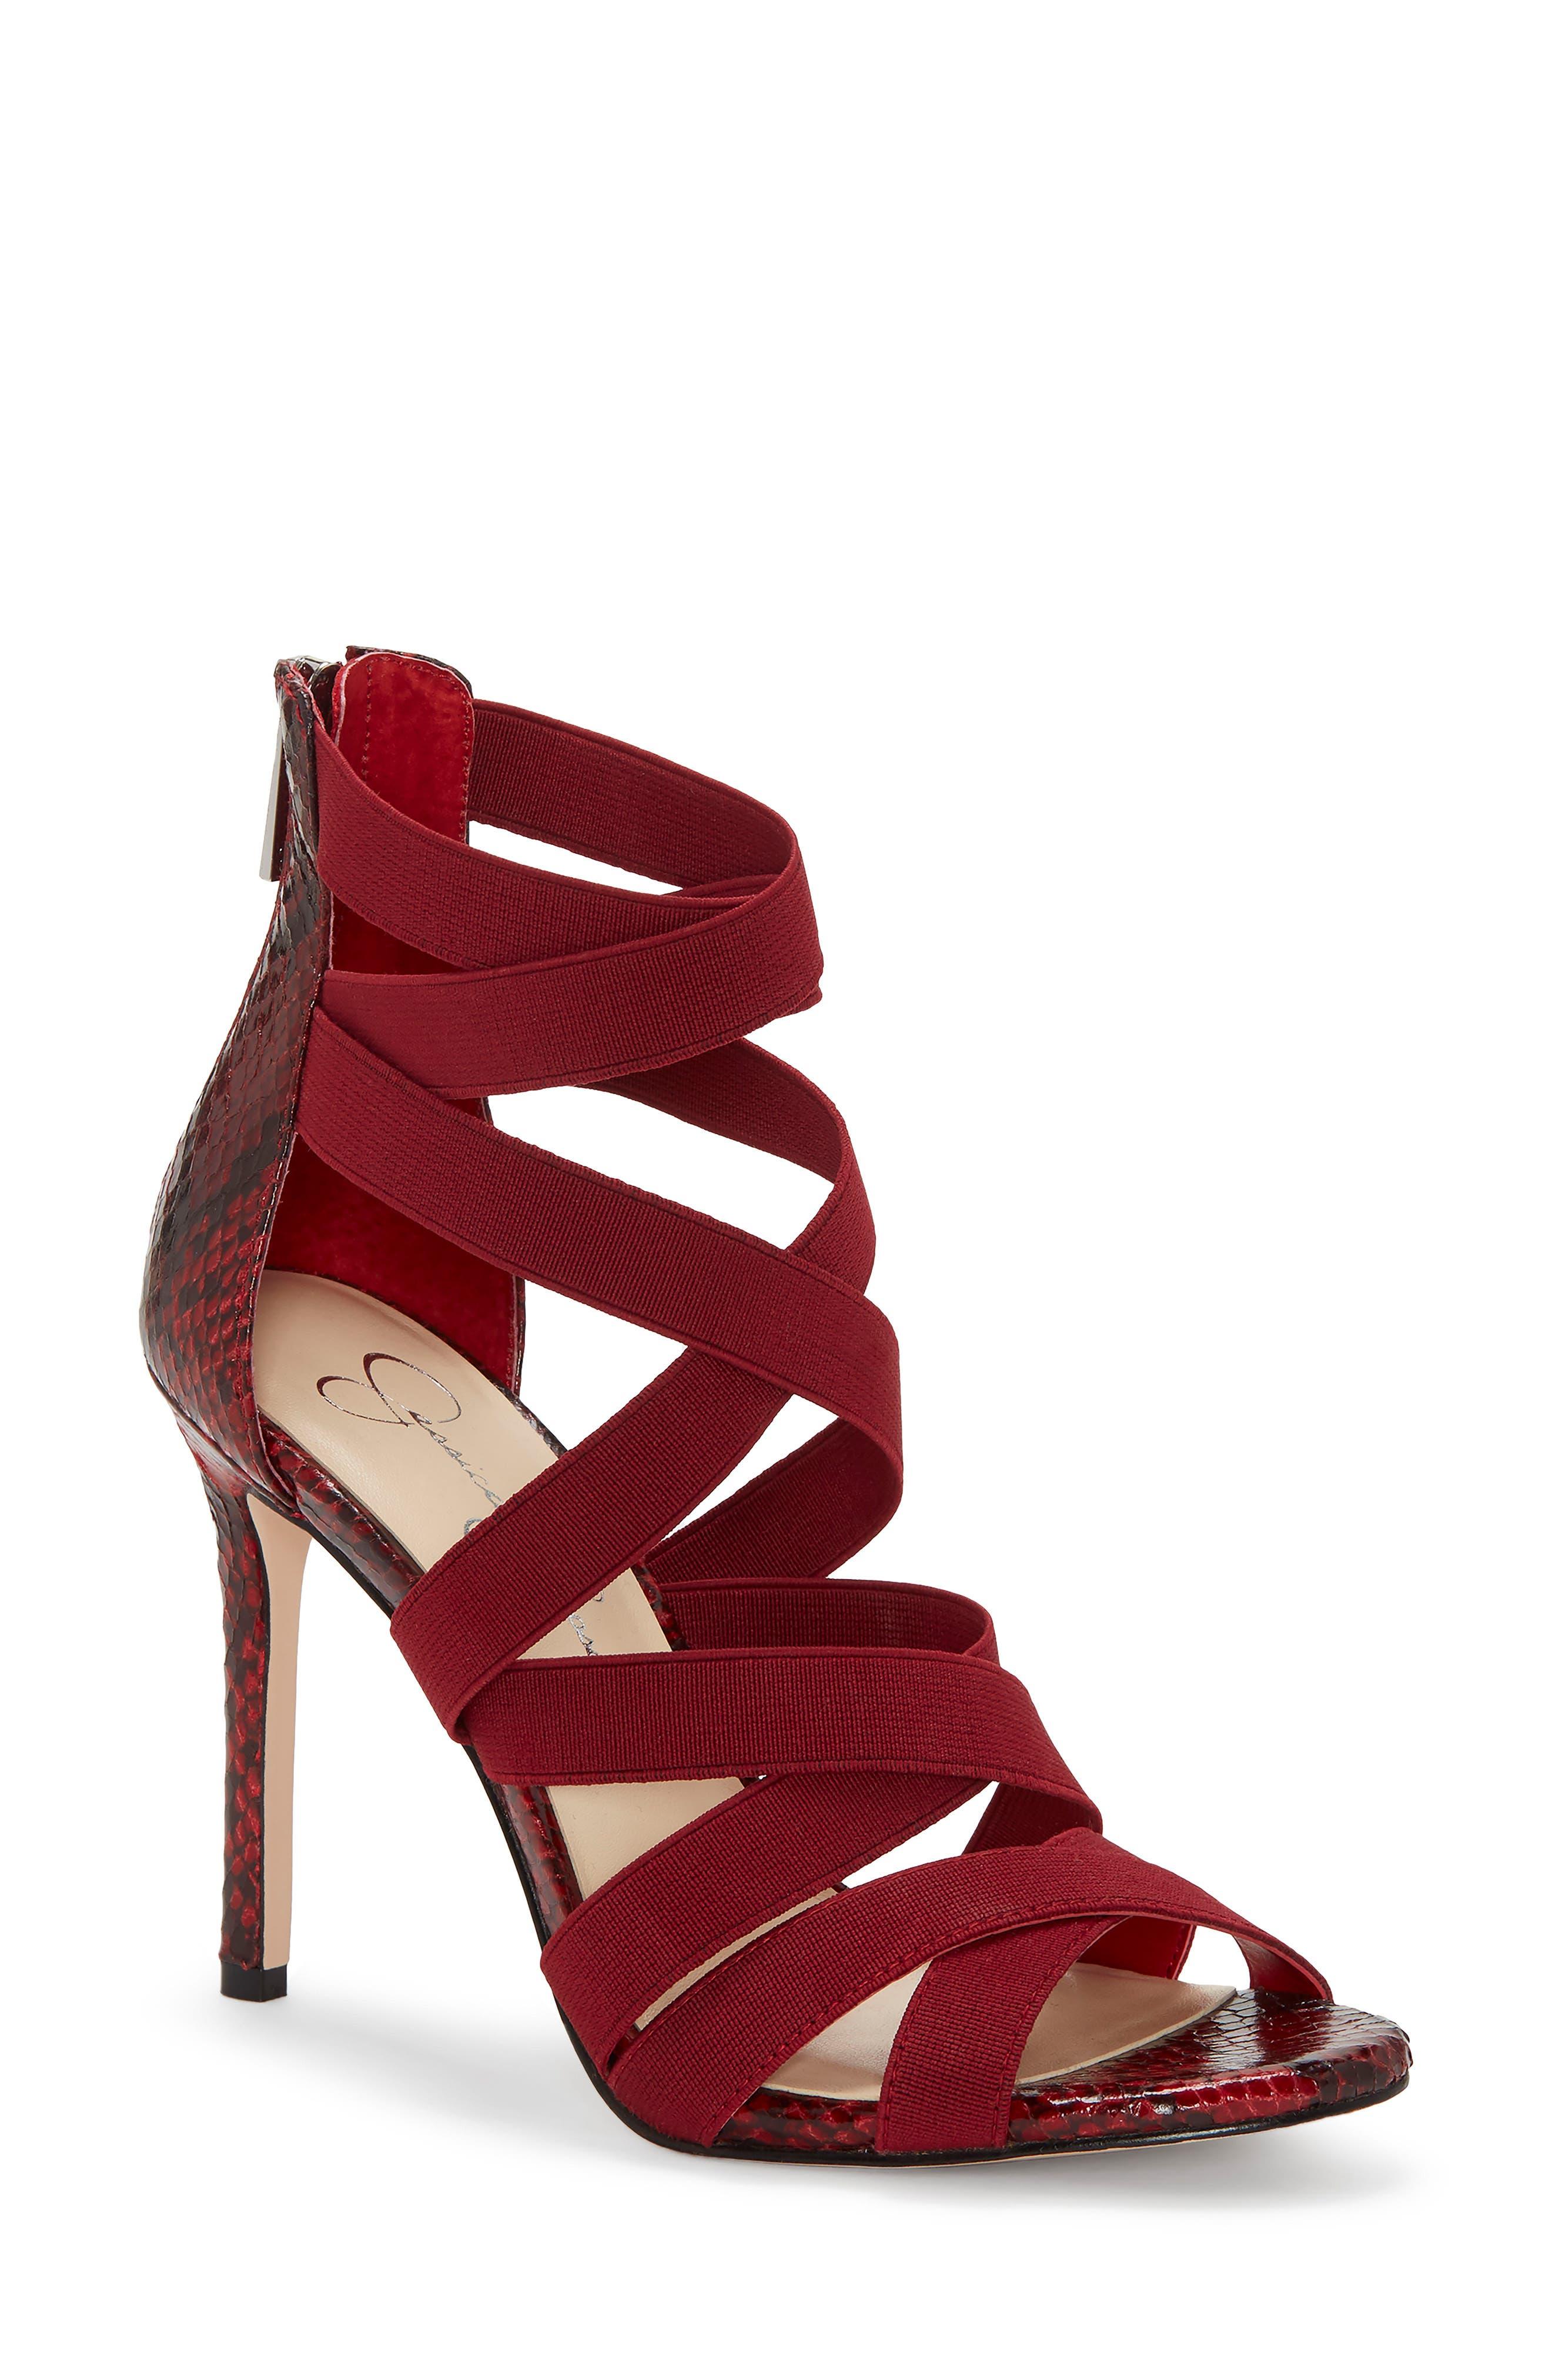 Jessica Simpson Jyra Sandal- Red